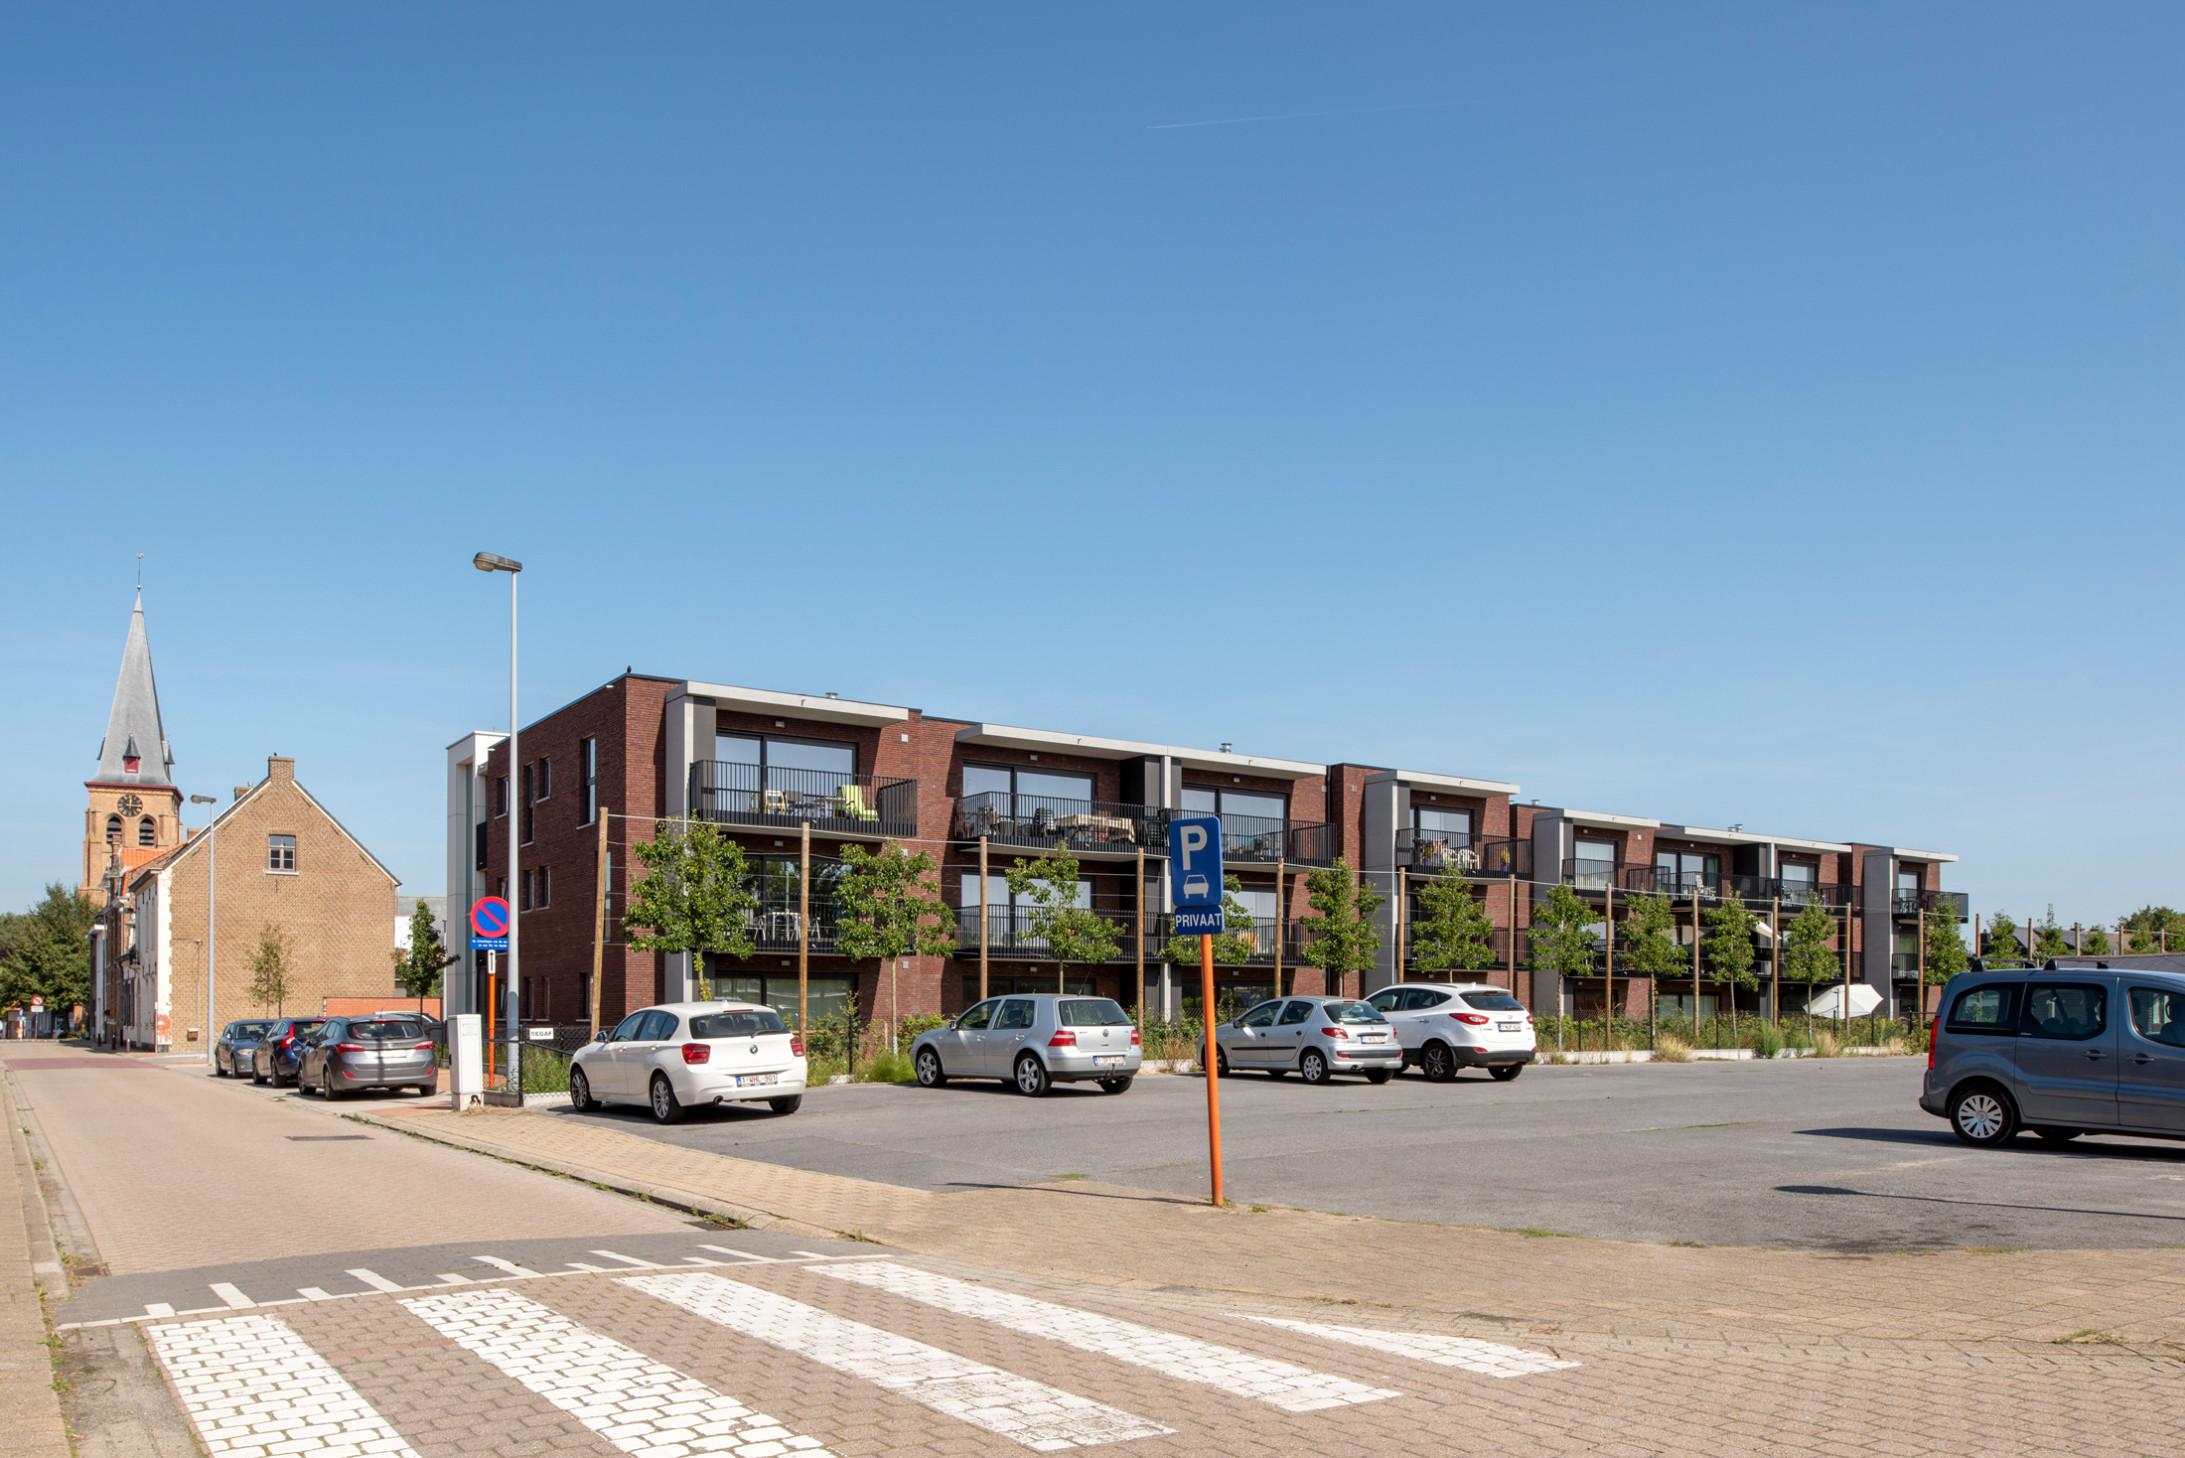 Meergezinswoning_Beernem2_Claeys Architecten.jpg